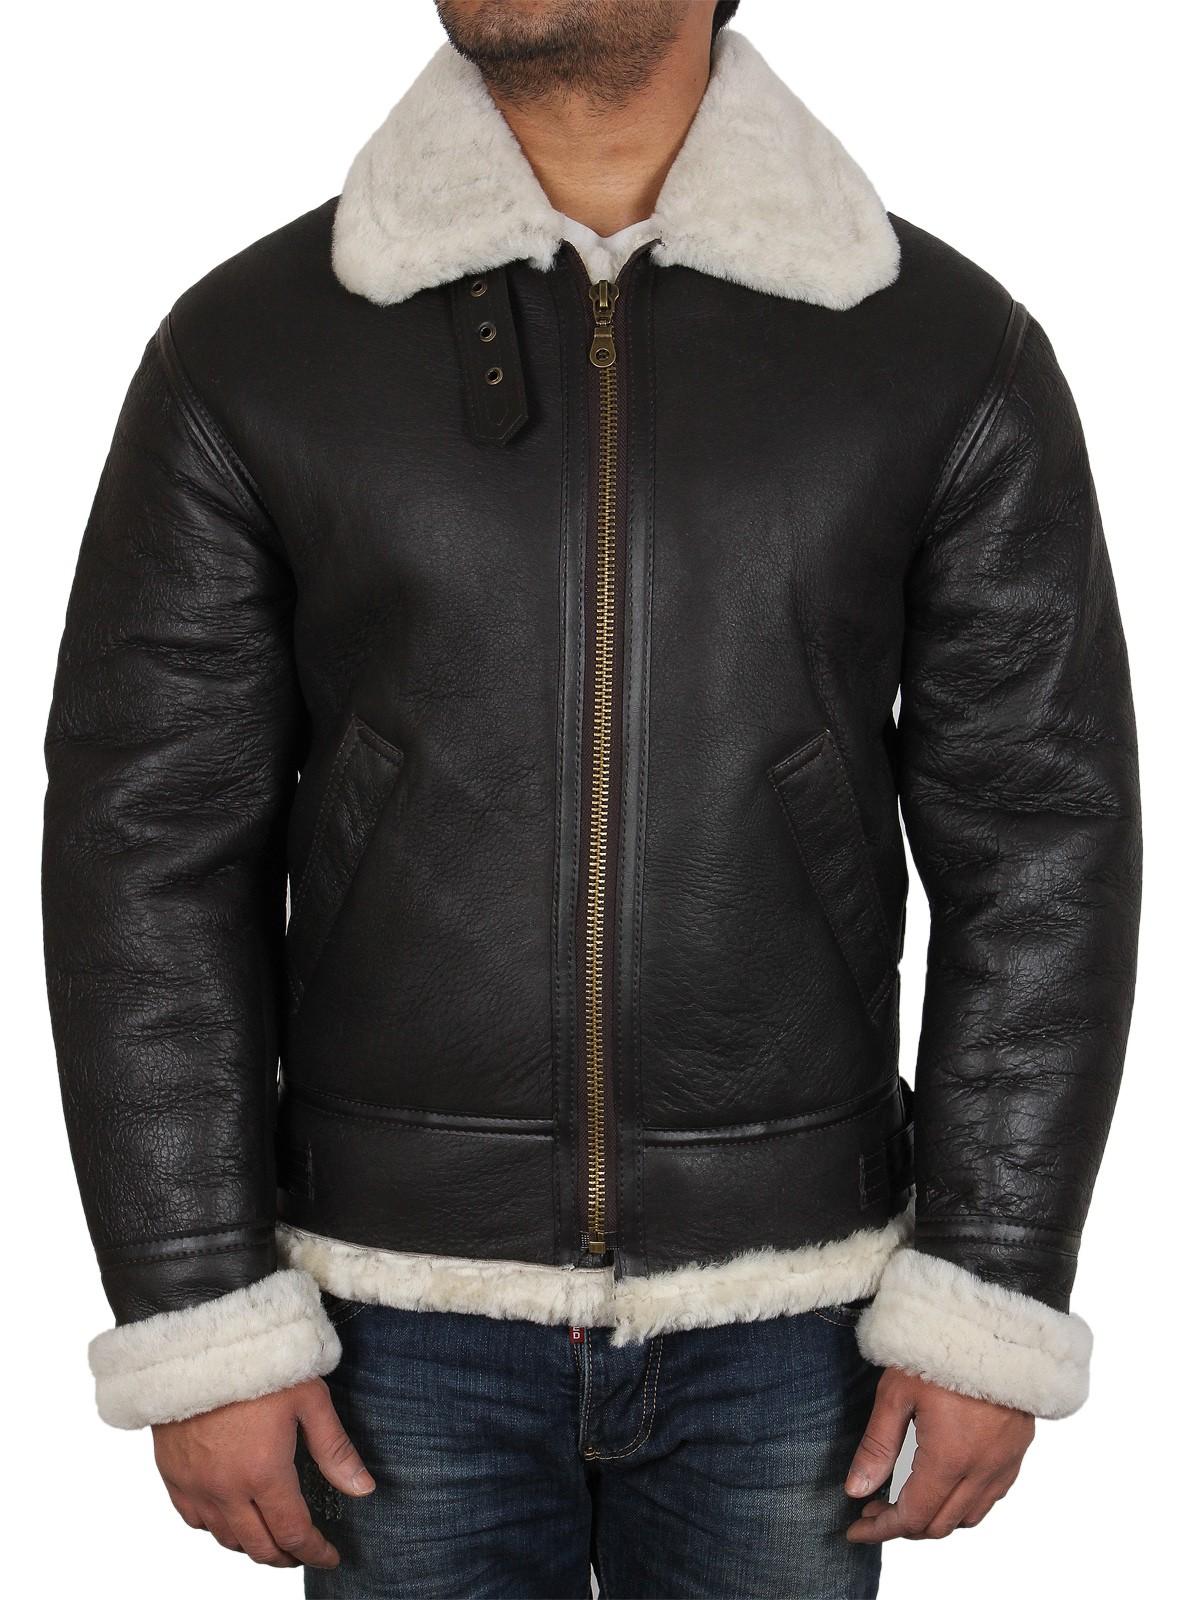 5cc148dea58 Men s Aviator Real Shearling Sheepskin Leather Flying Jacket